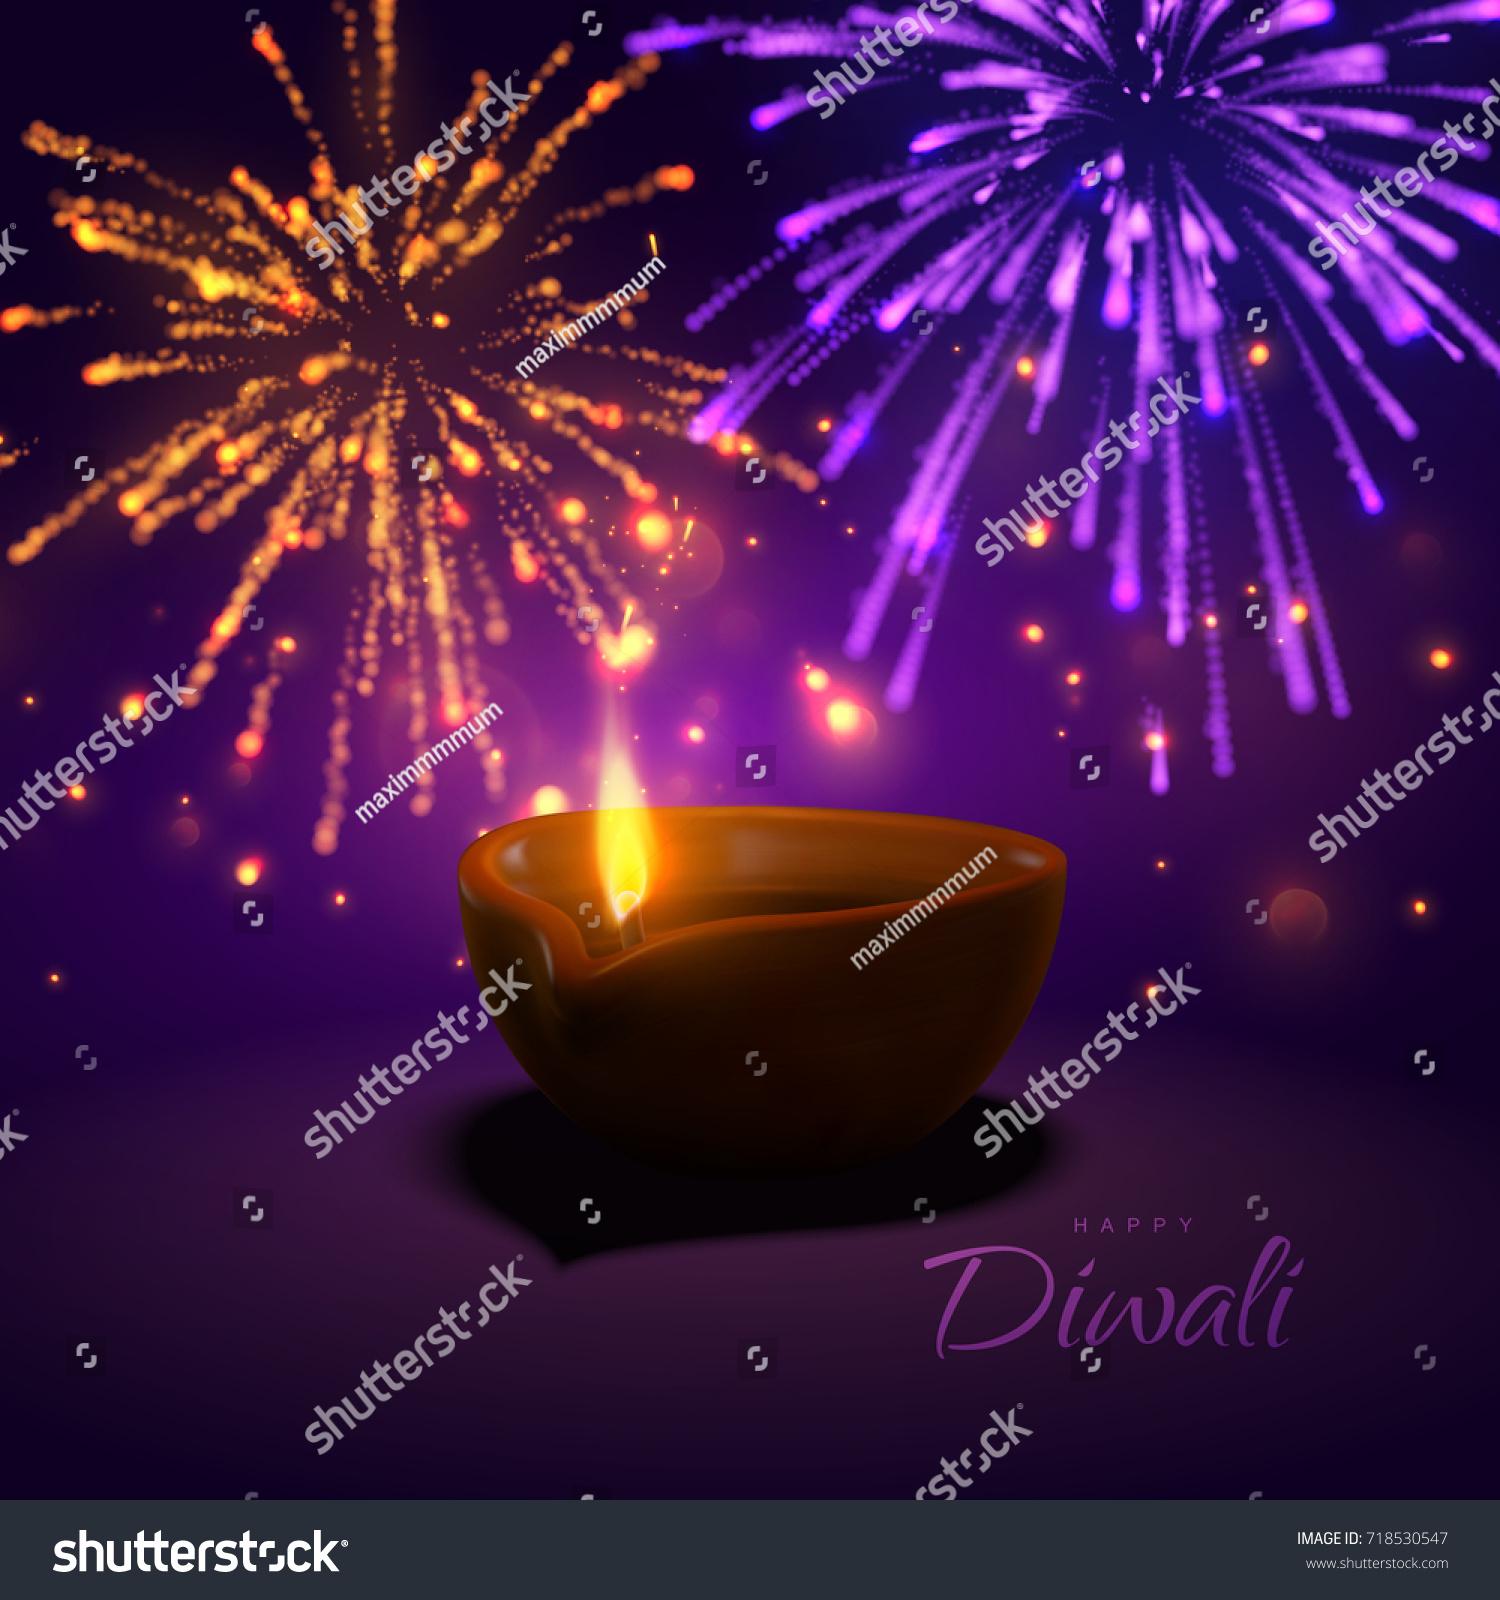 short essay on diwali celebration